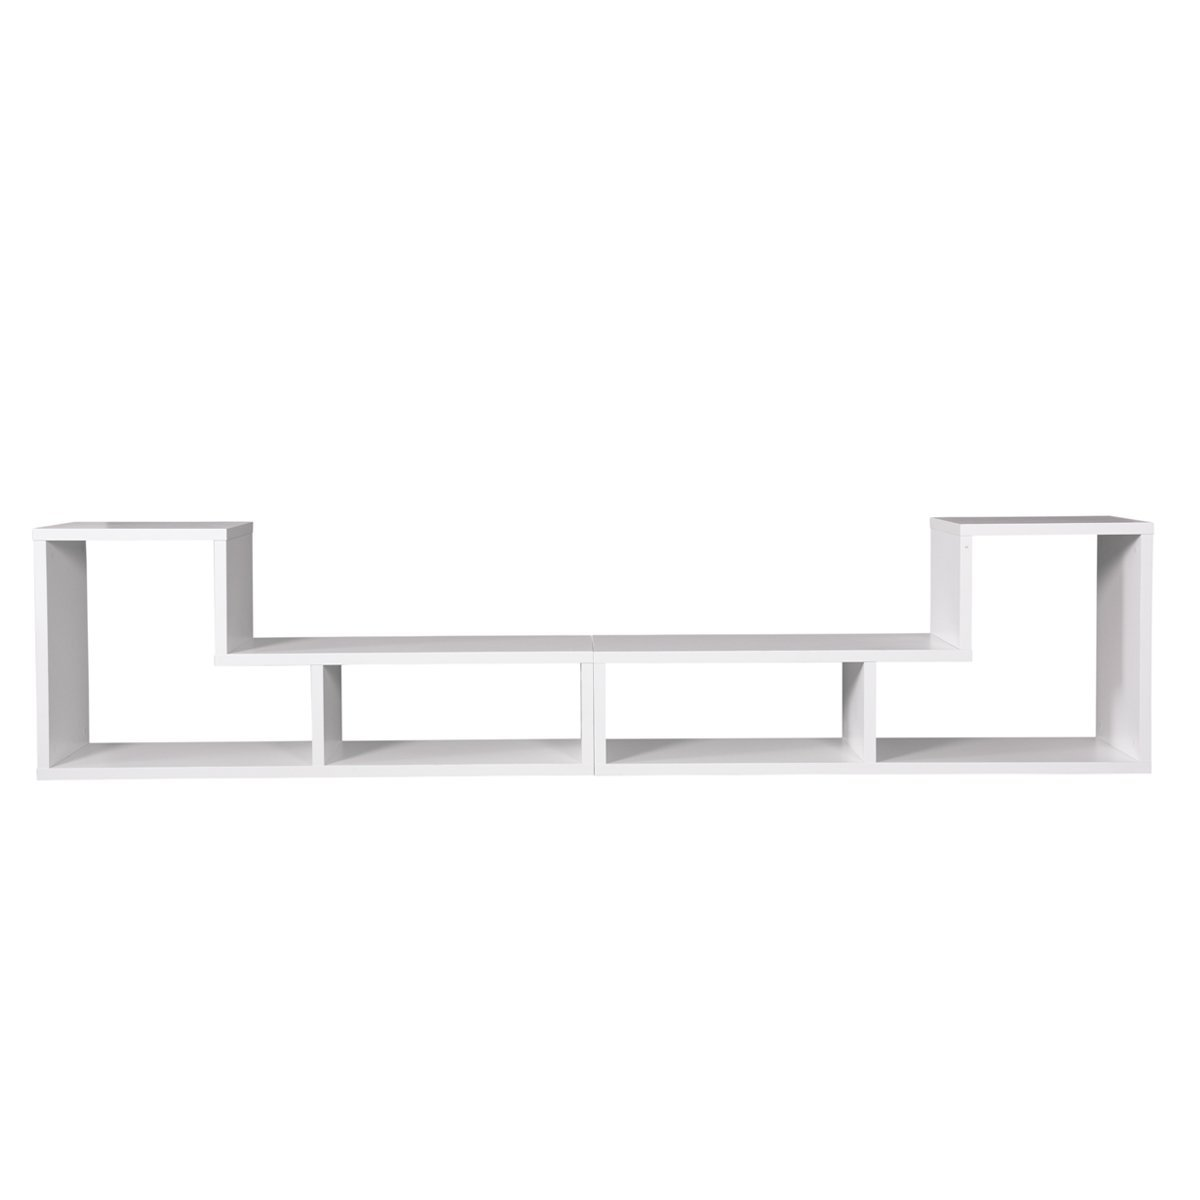 Schwarz DEVAISE Multifunctional H/ölzernen TV-Lowboard TV Schrank; 15mm Dicke B/ücherregal